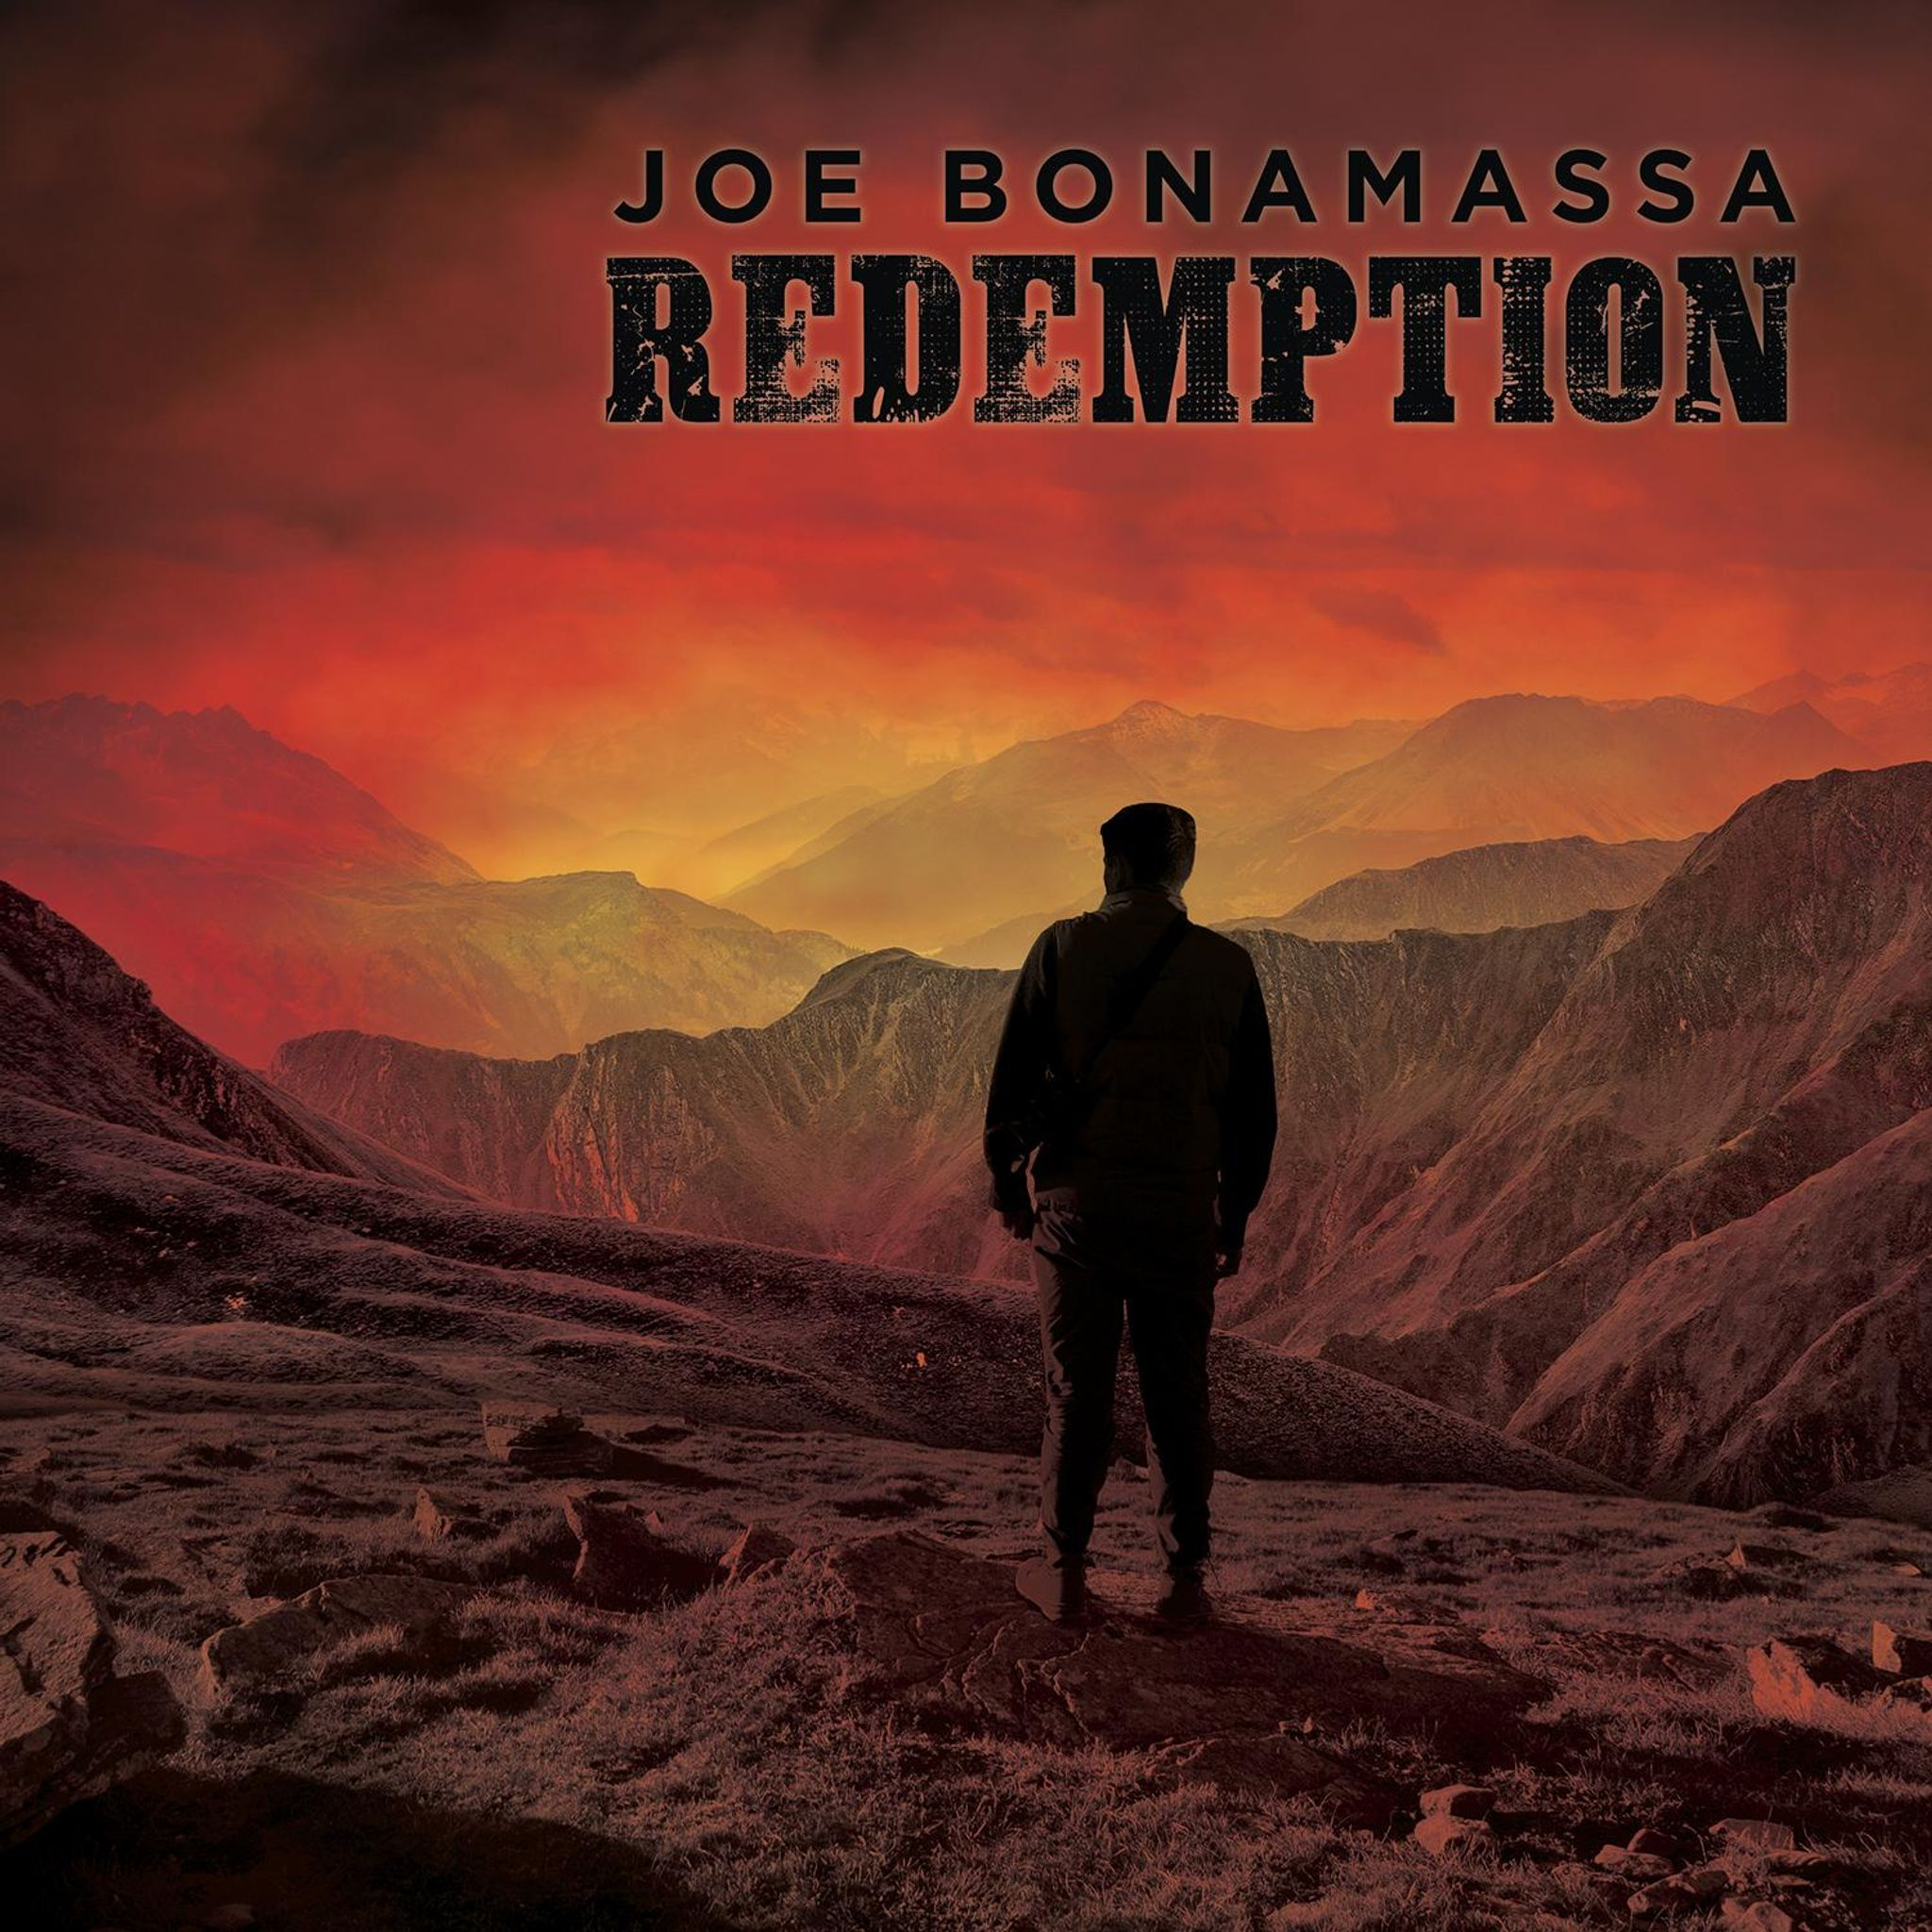 Review: Joe Bonamassa rocks the blues hard on \'Redemption ...